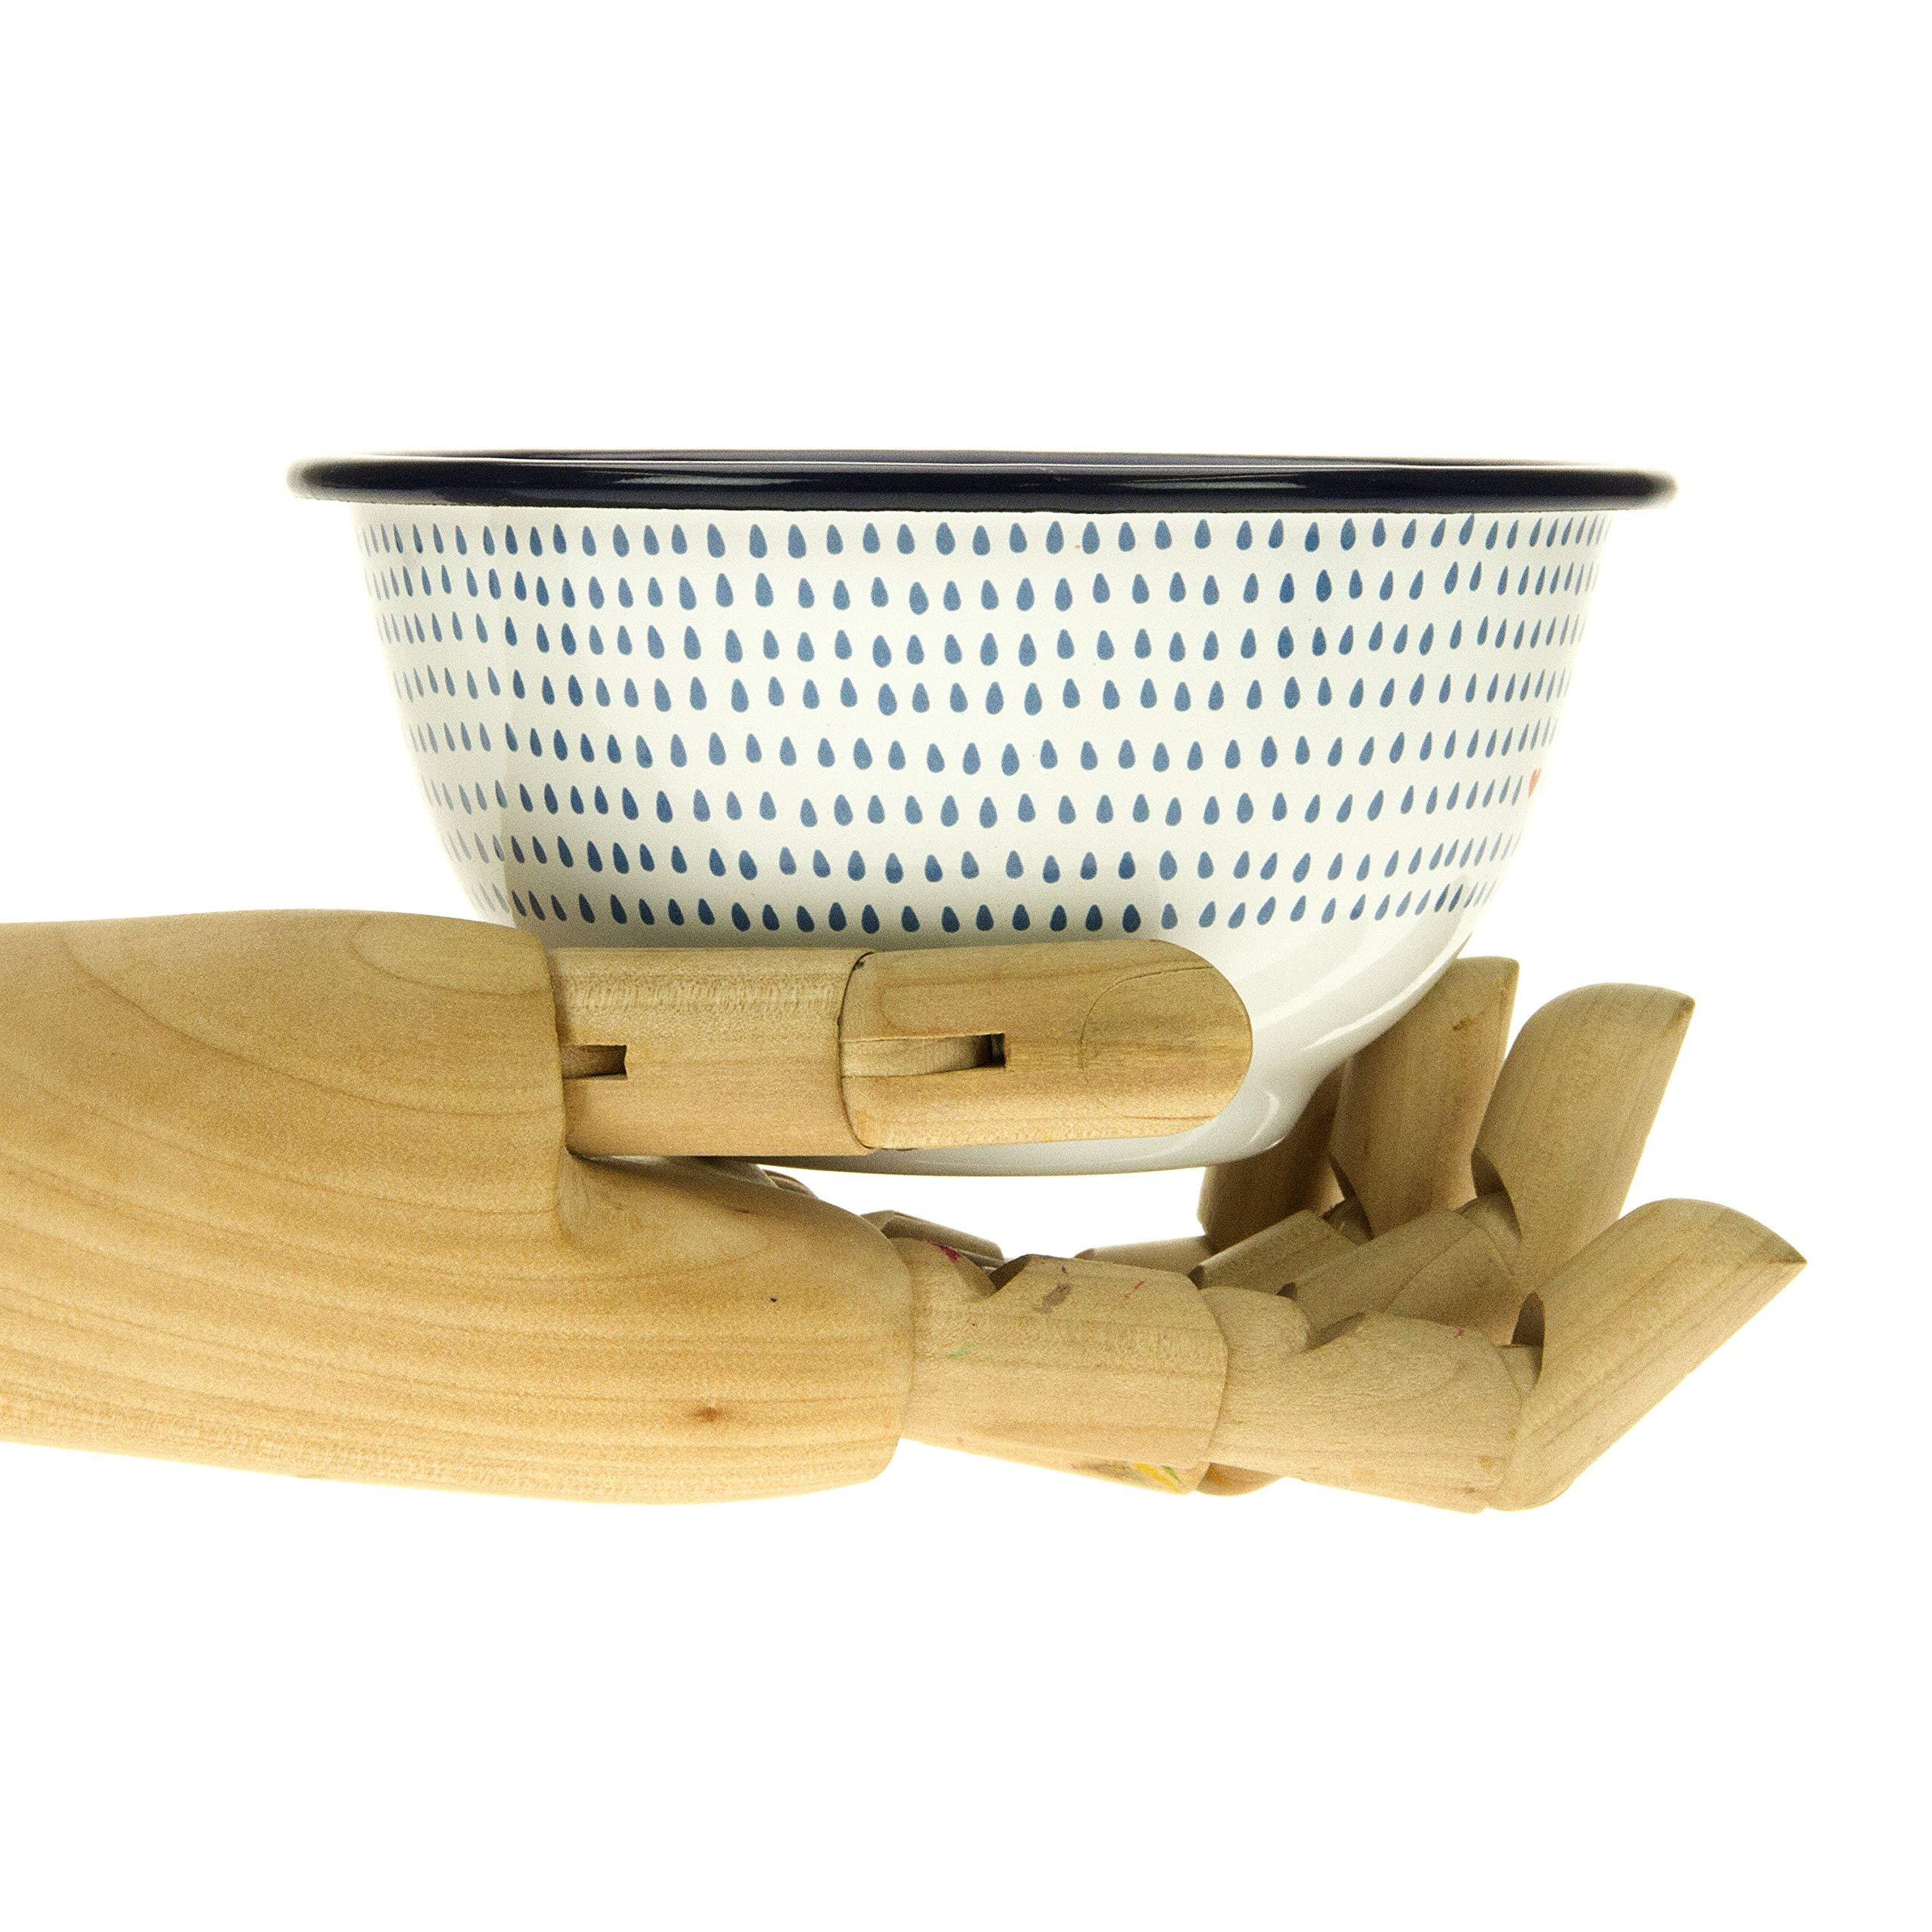 Folklore Enamel Bowls, Seasons Designs (Set of 4) by Folklore (Image #4)